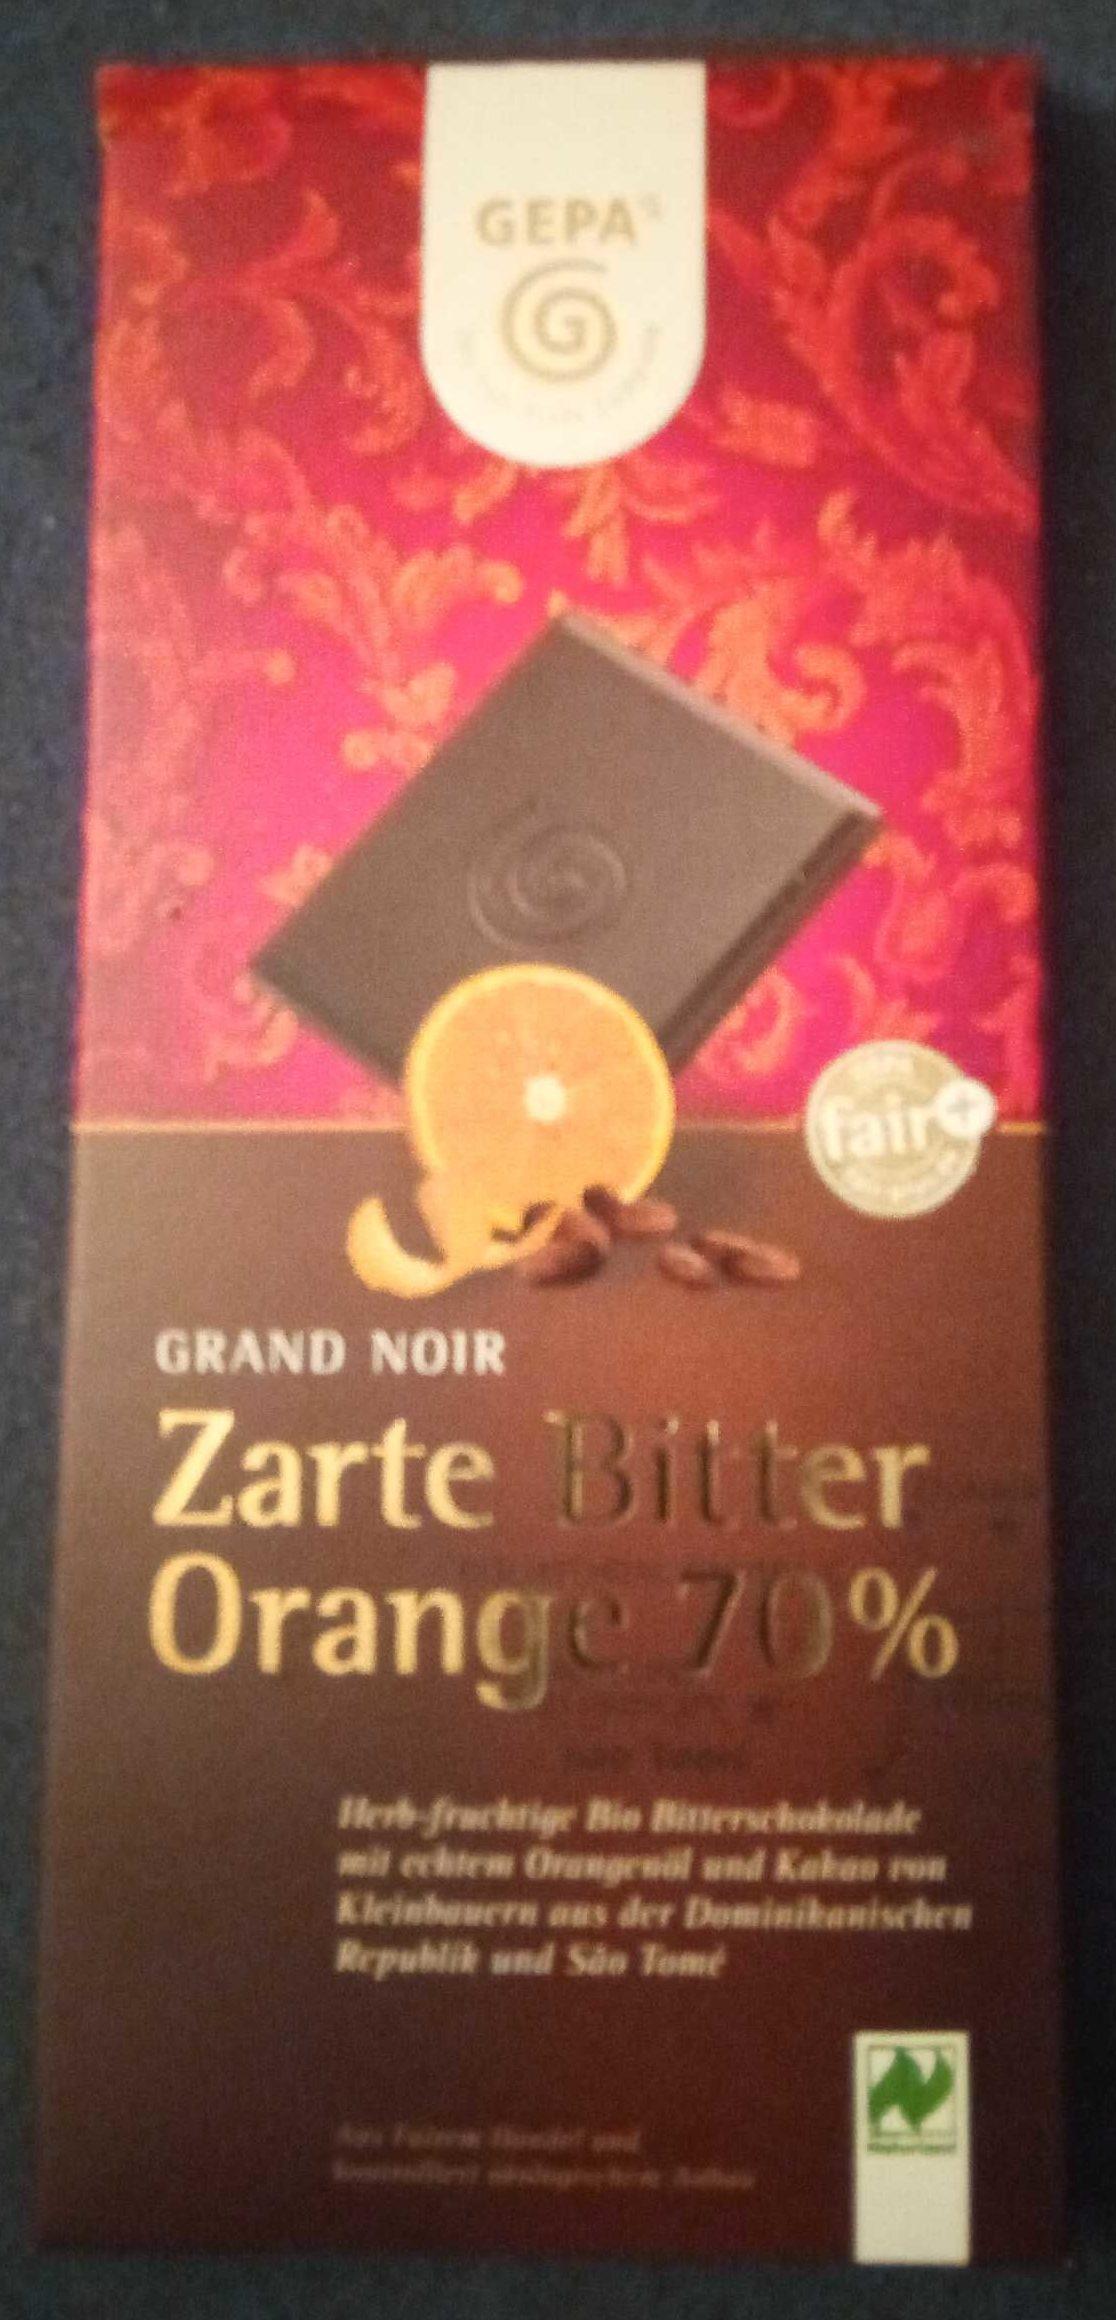 Zarte Bitter Orange 70% - Product